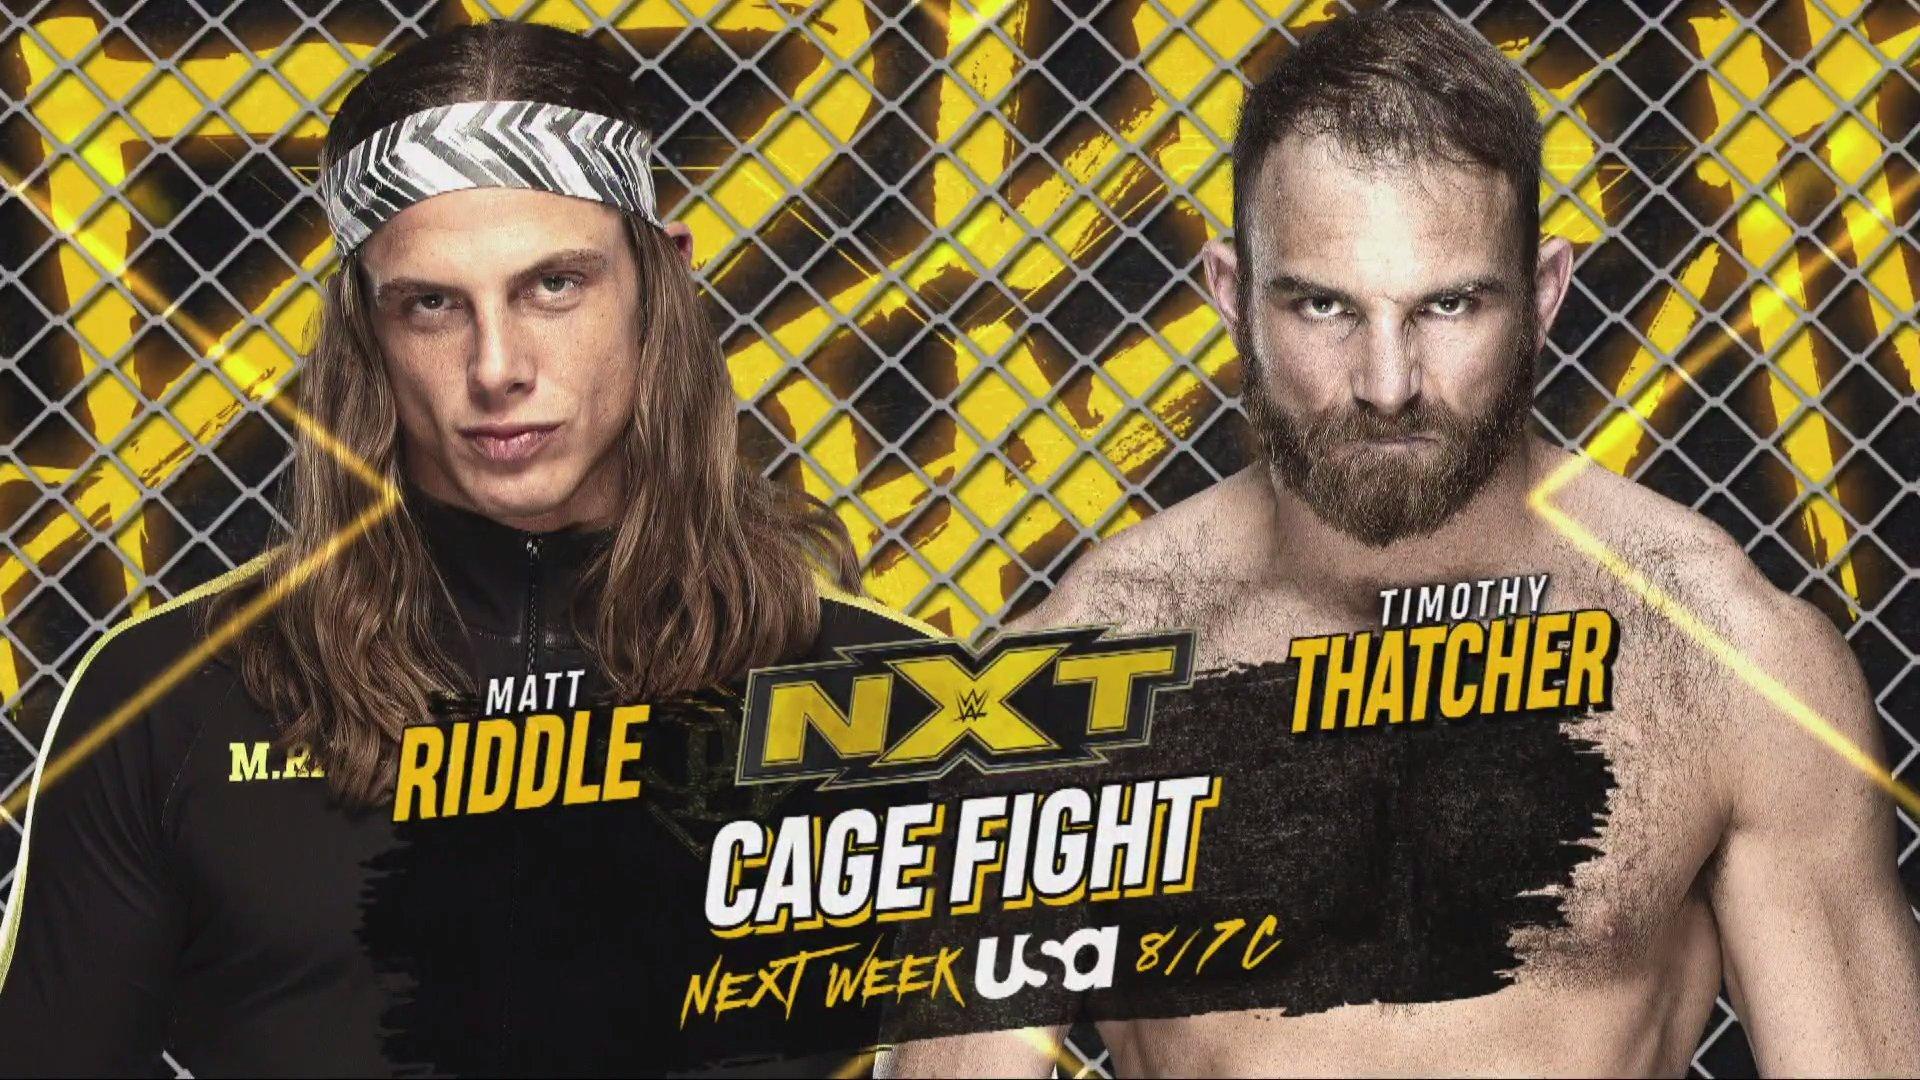 Steel Cage Match anunciada para o próximo WWE NXT